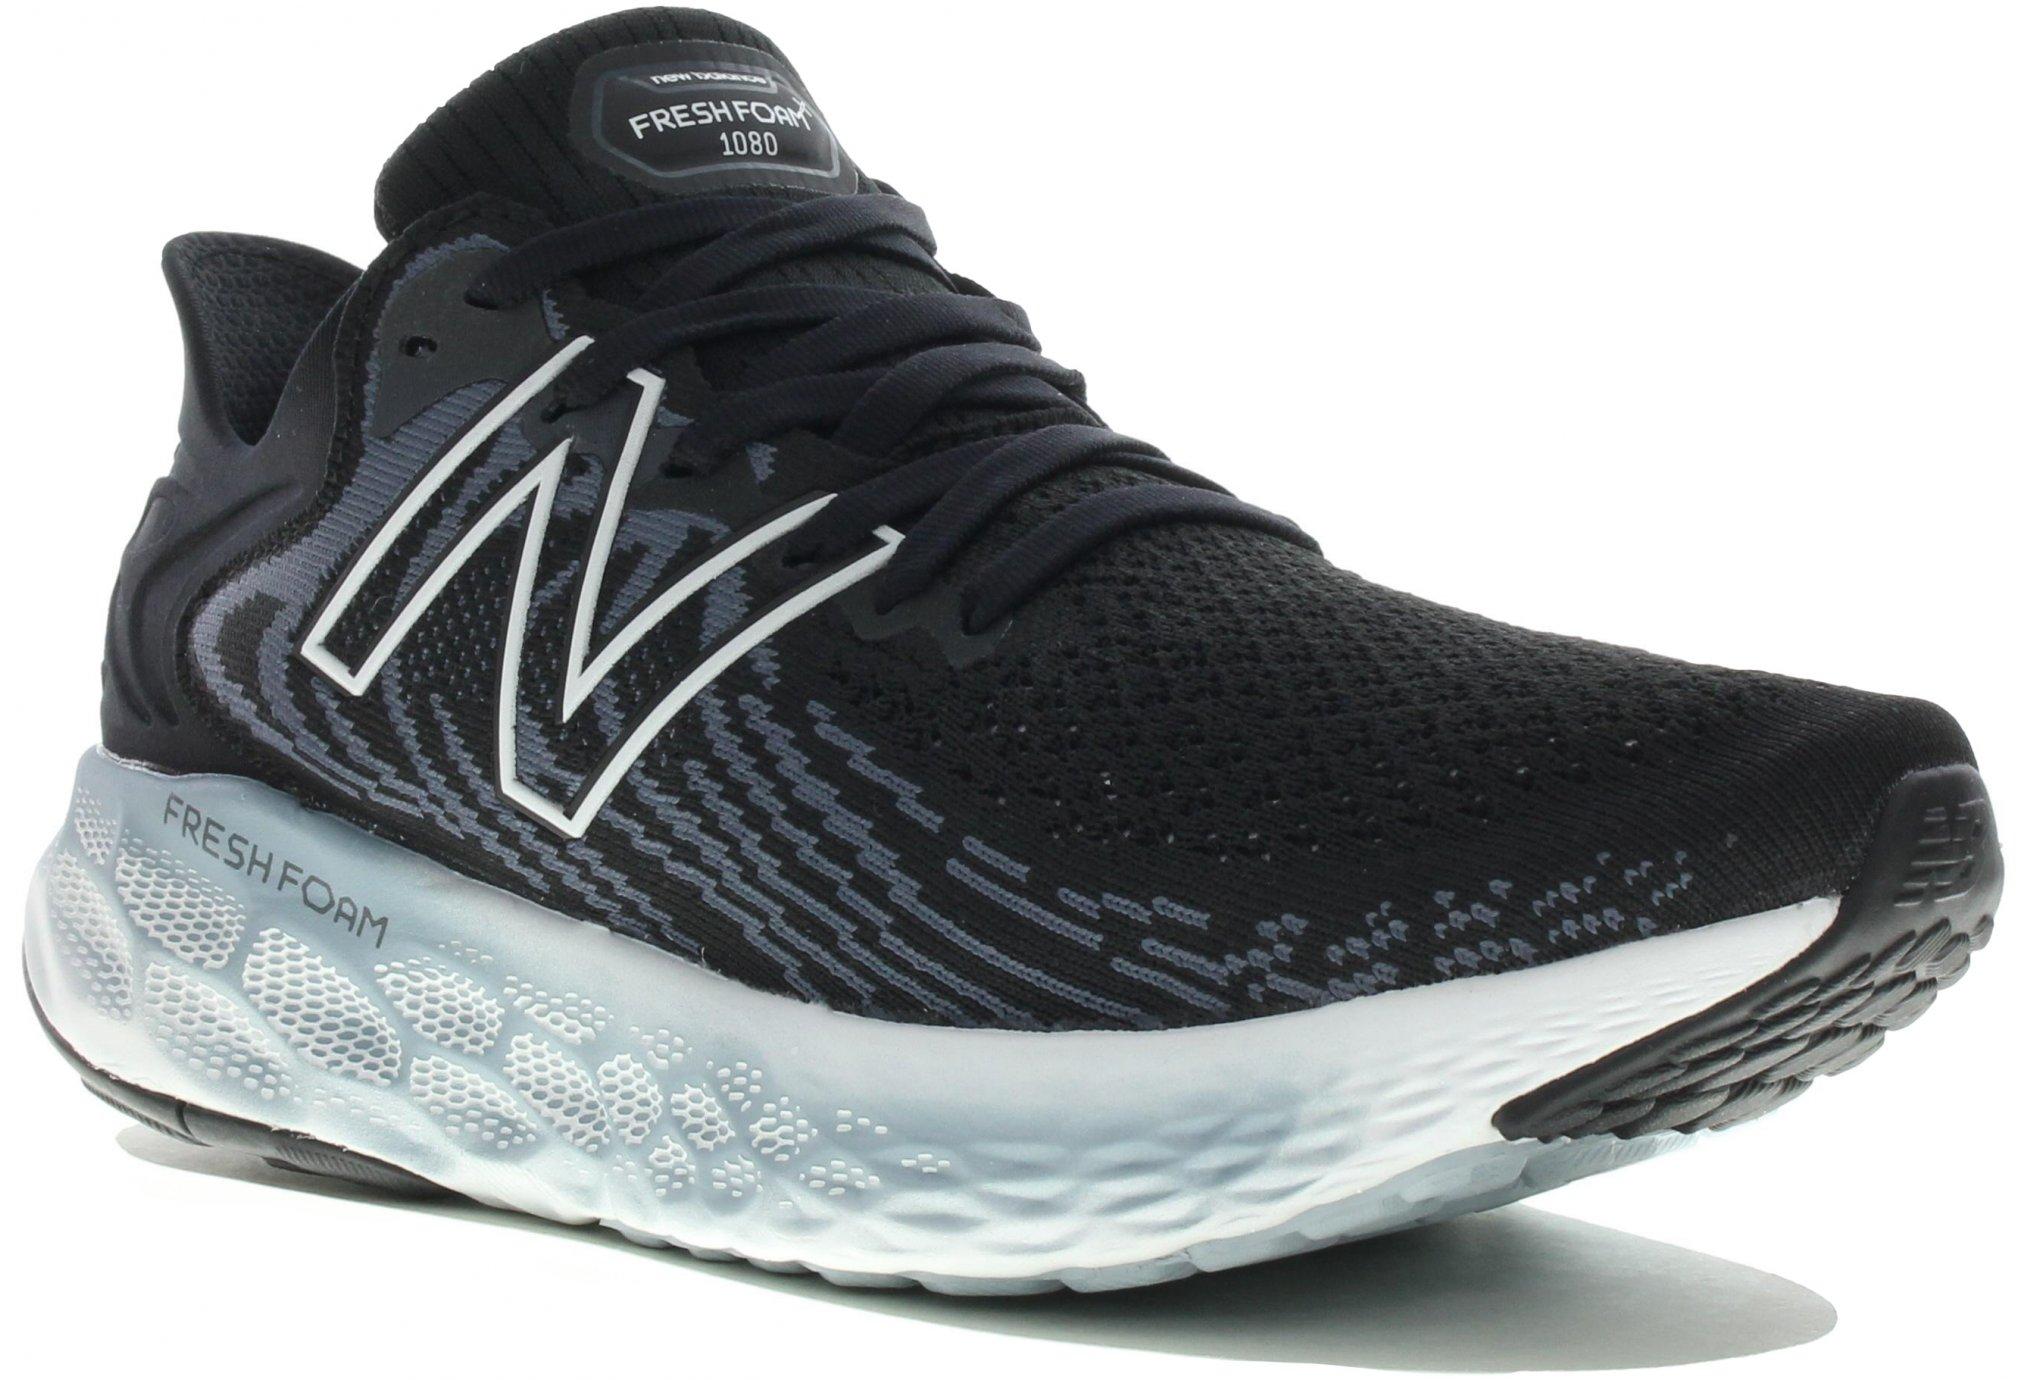 New Balance Fresh Foam W 1080 V11 - B Chaussures running femme